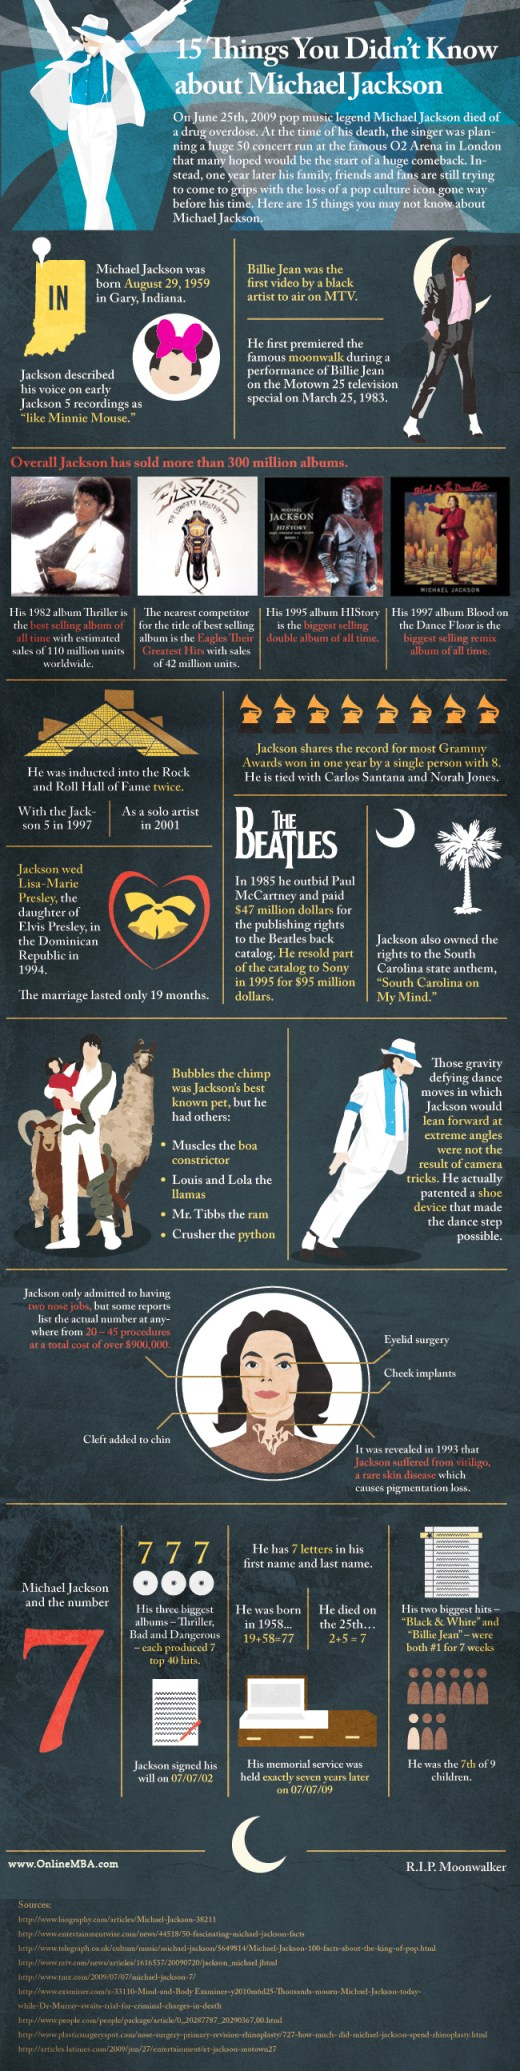 Infografía 15 cosas que no sabías de Michael Jackson